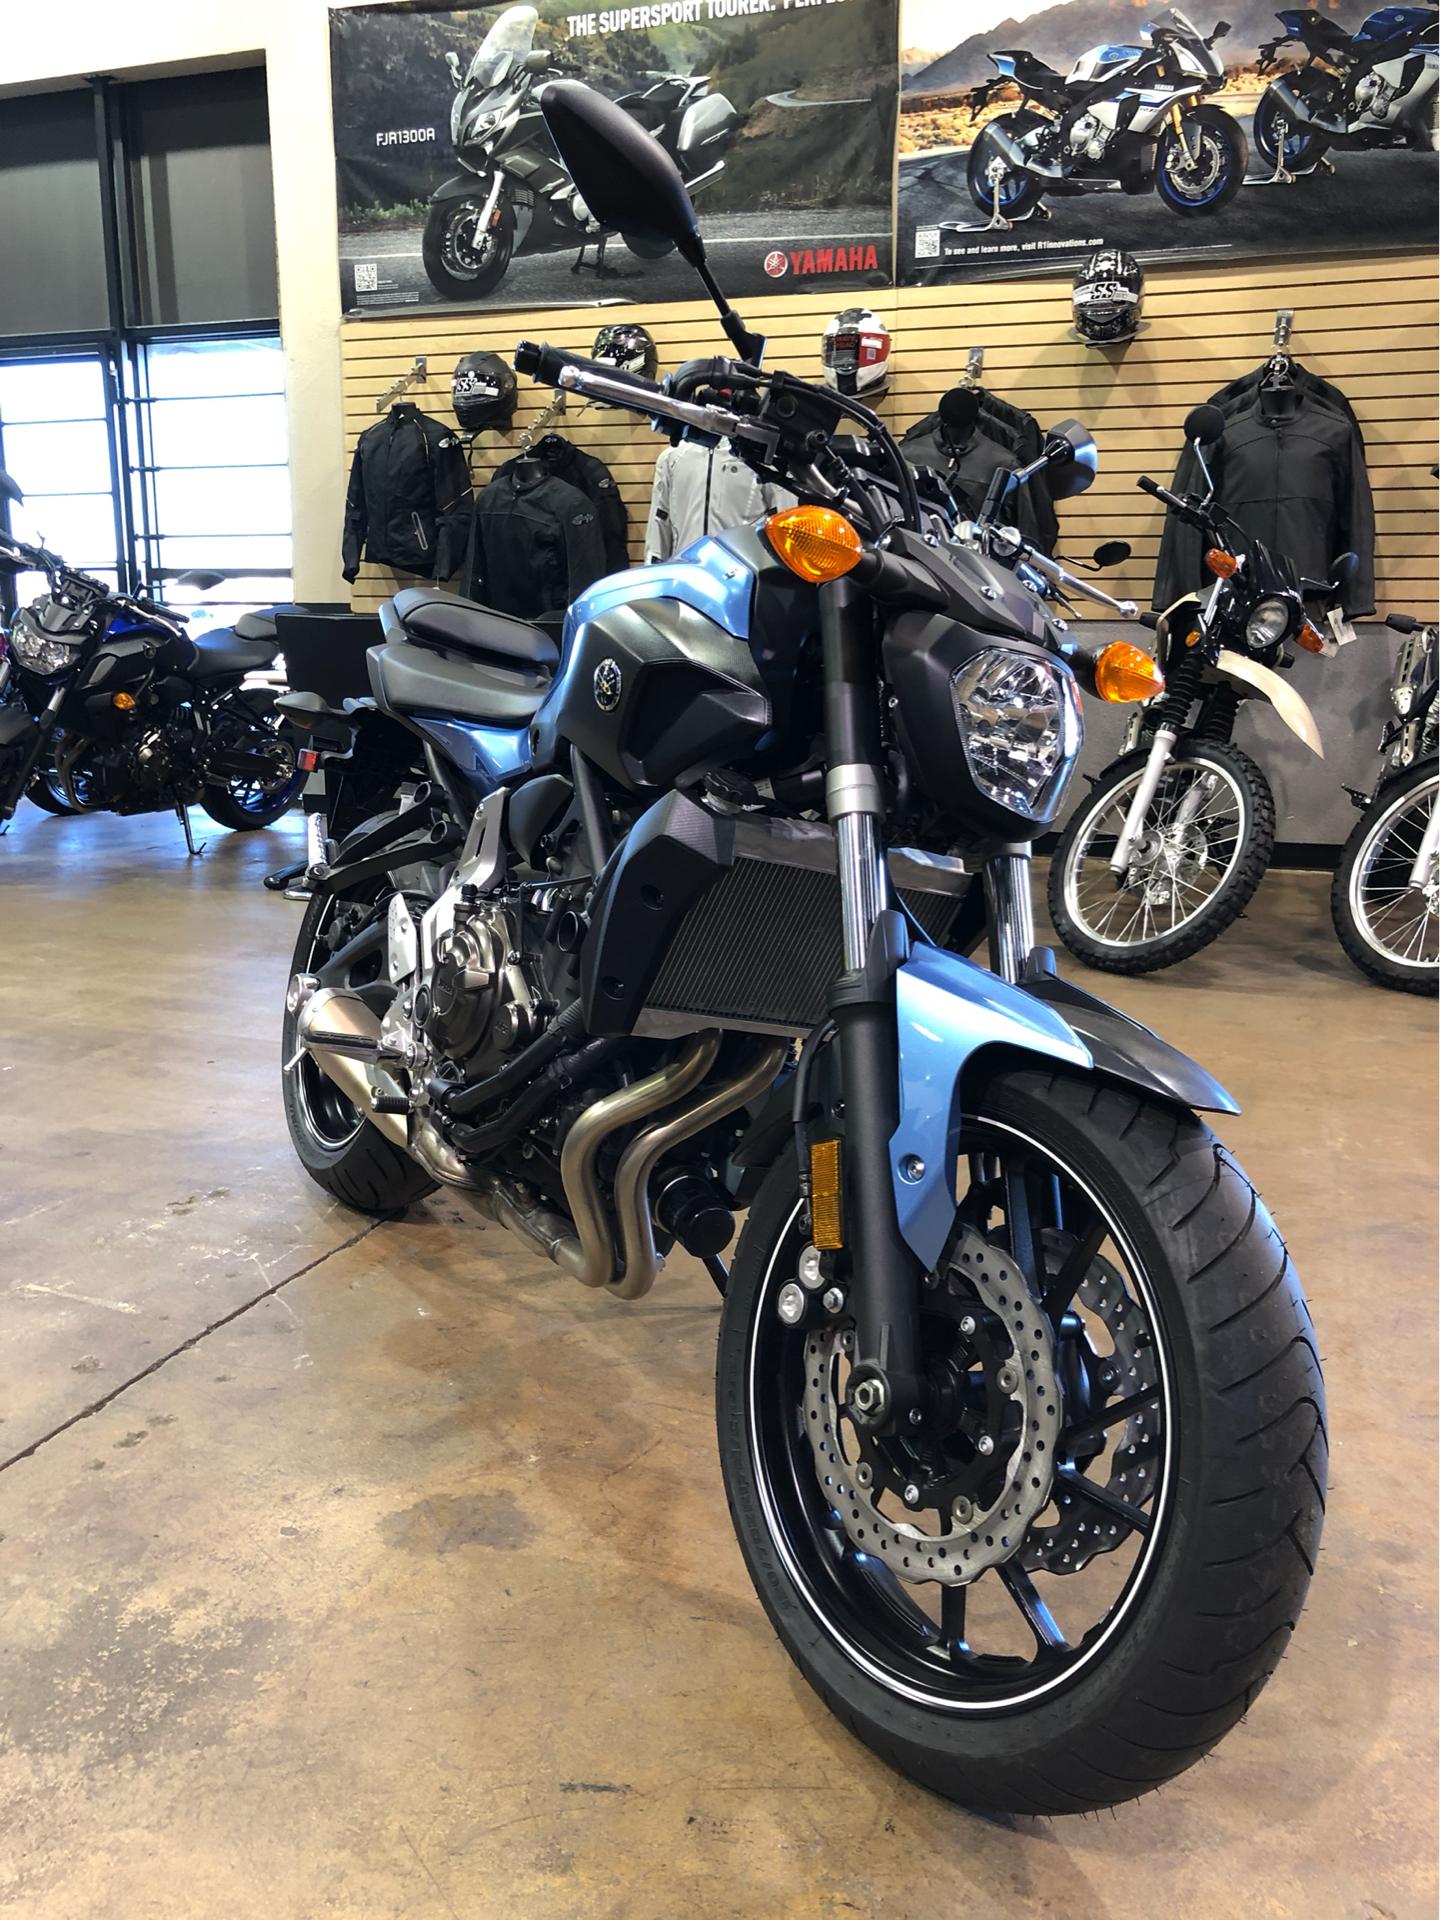 2017 Yamaha FZ-07 in Denver, Colorado